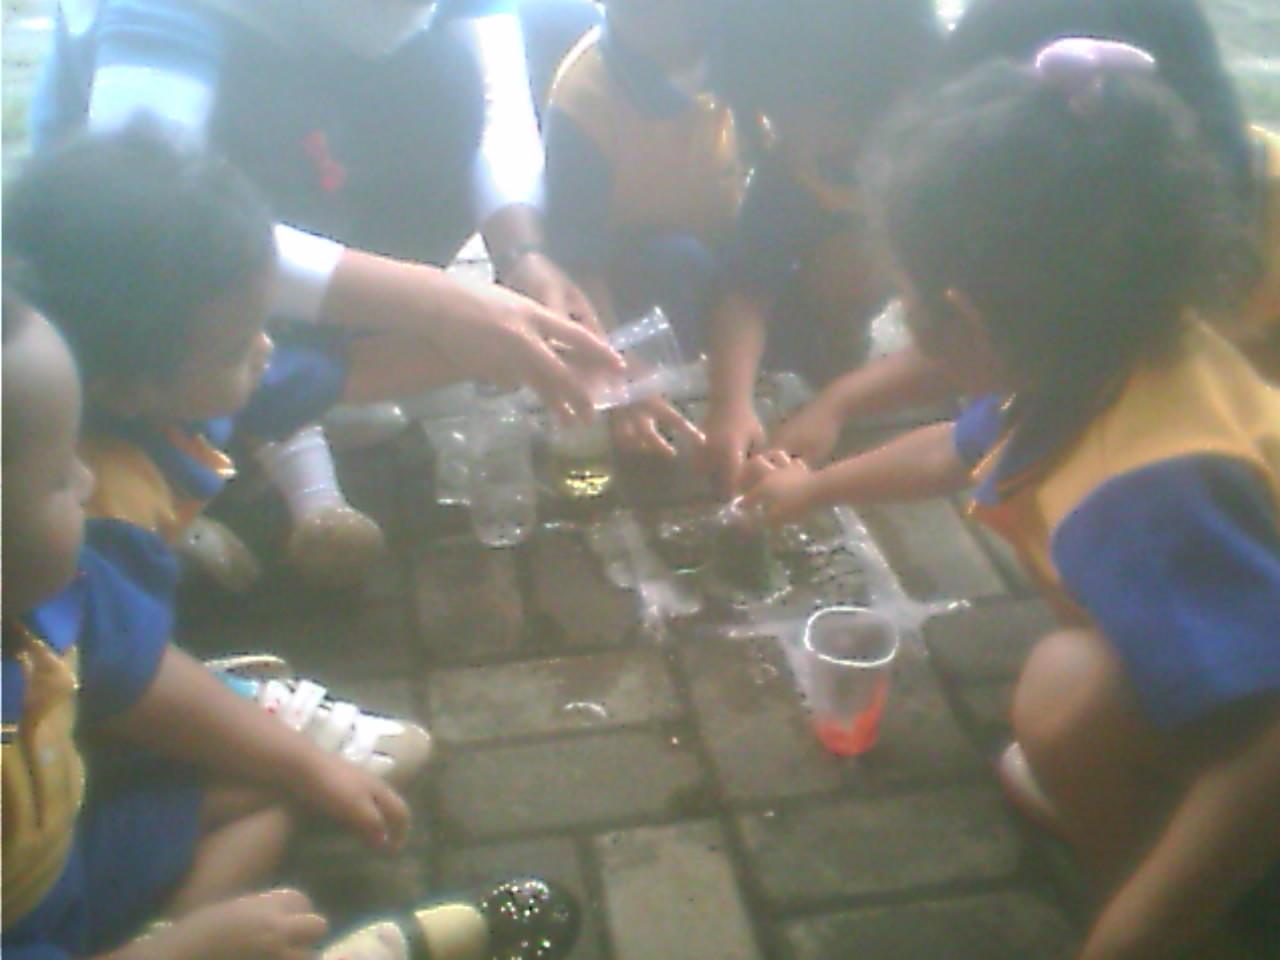 Sains Academy